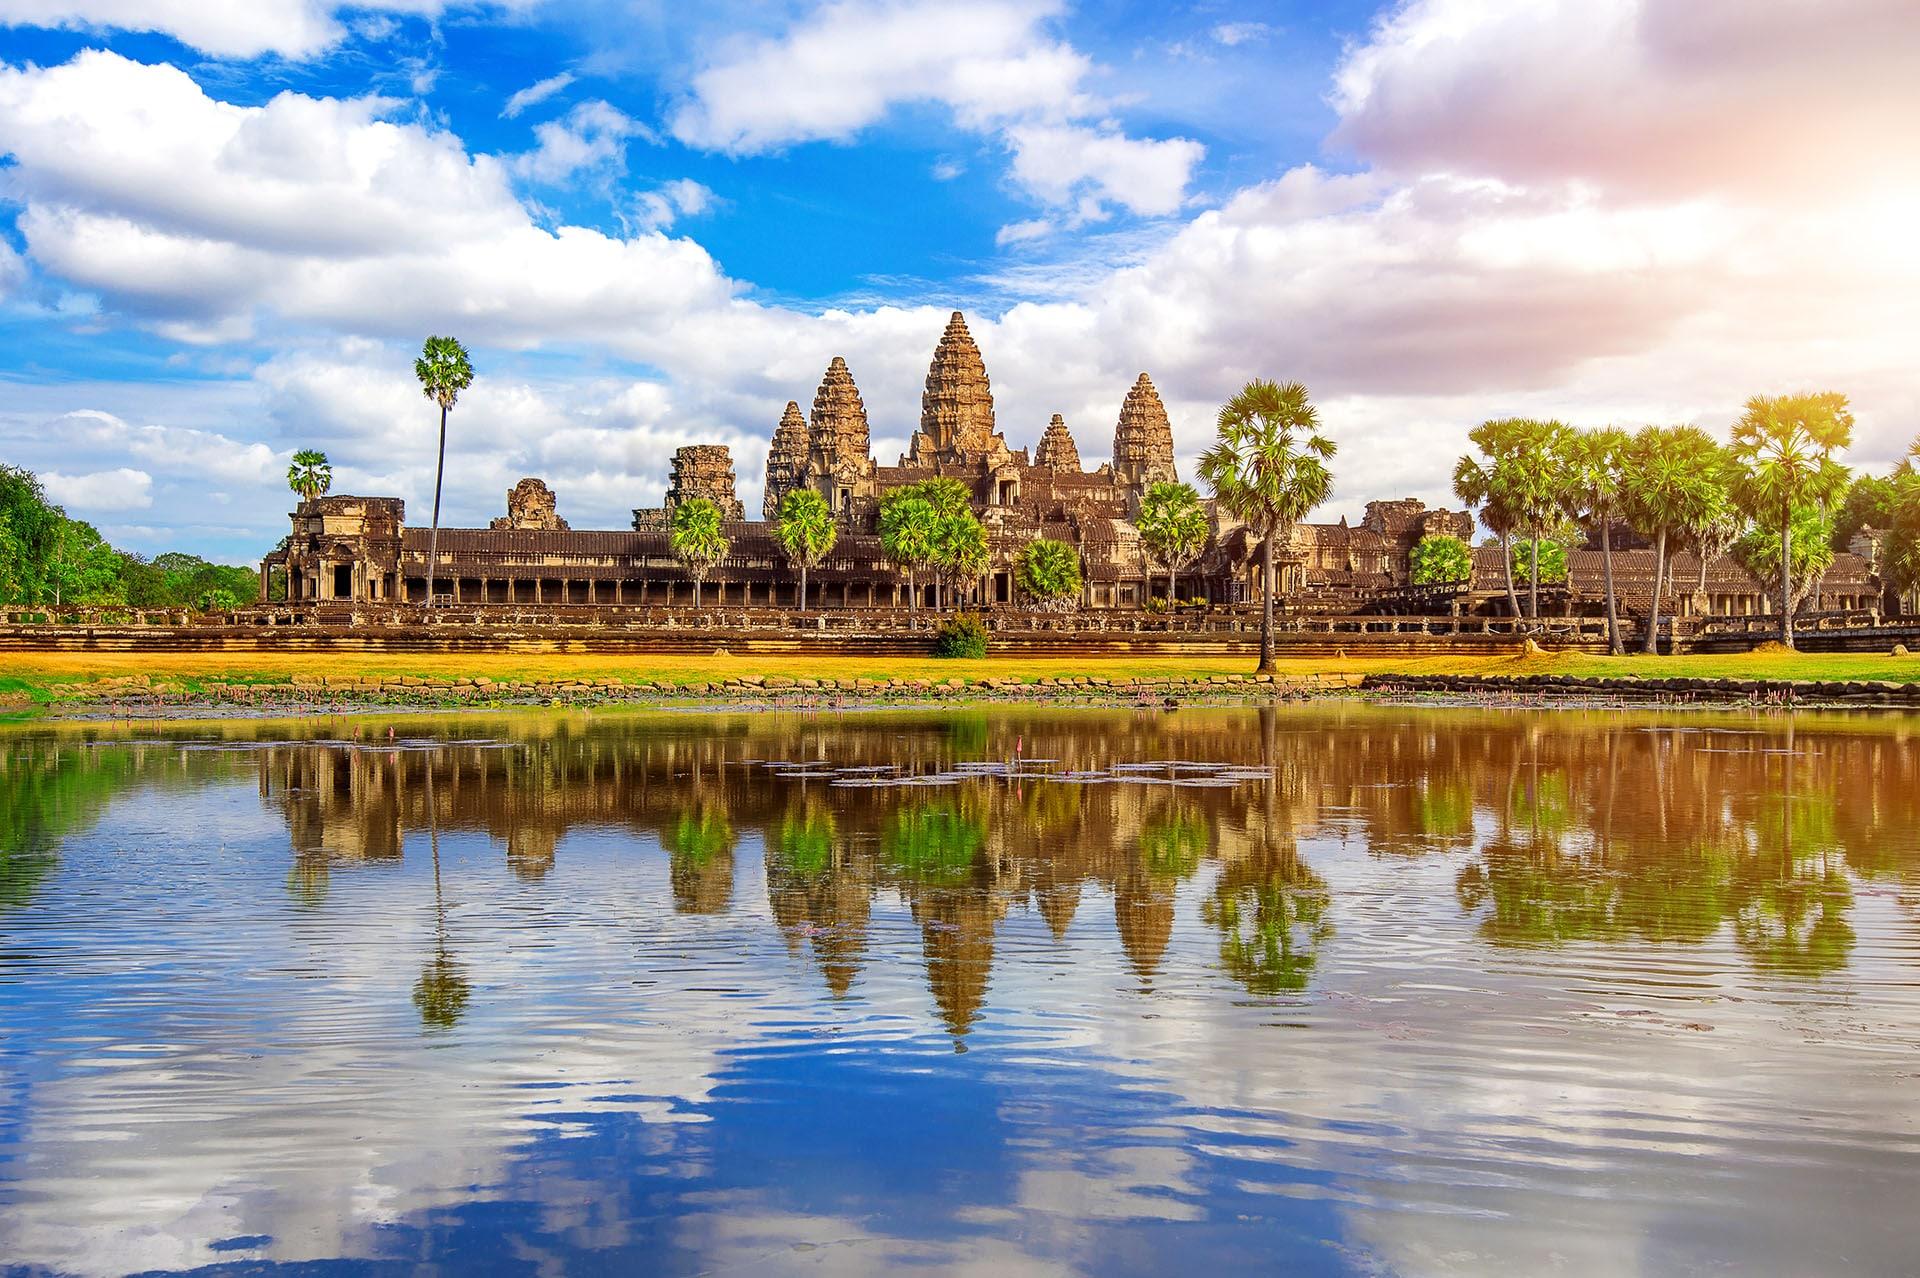 Abenteuerreisen & Erlebnisreisen: Angkor Wat Kambodscha